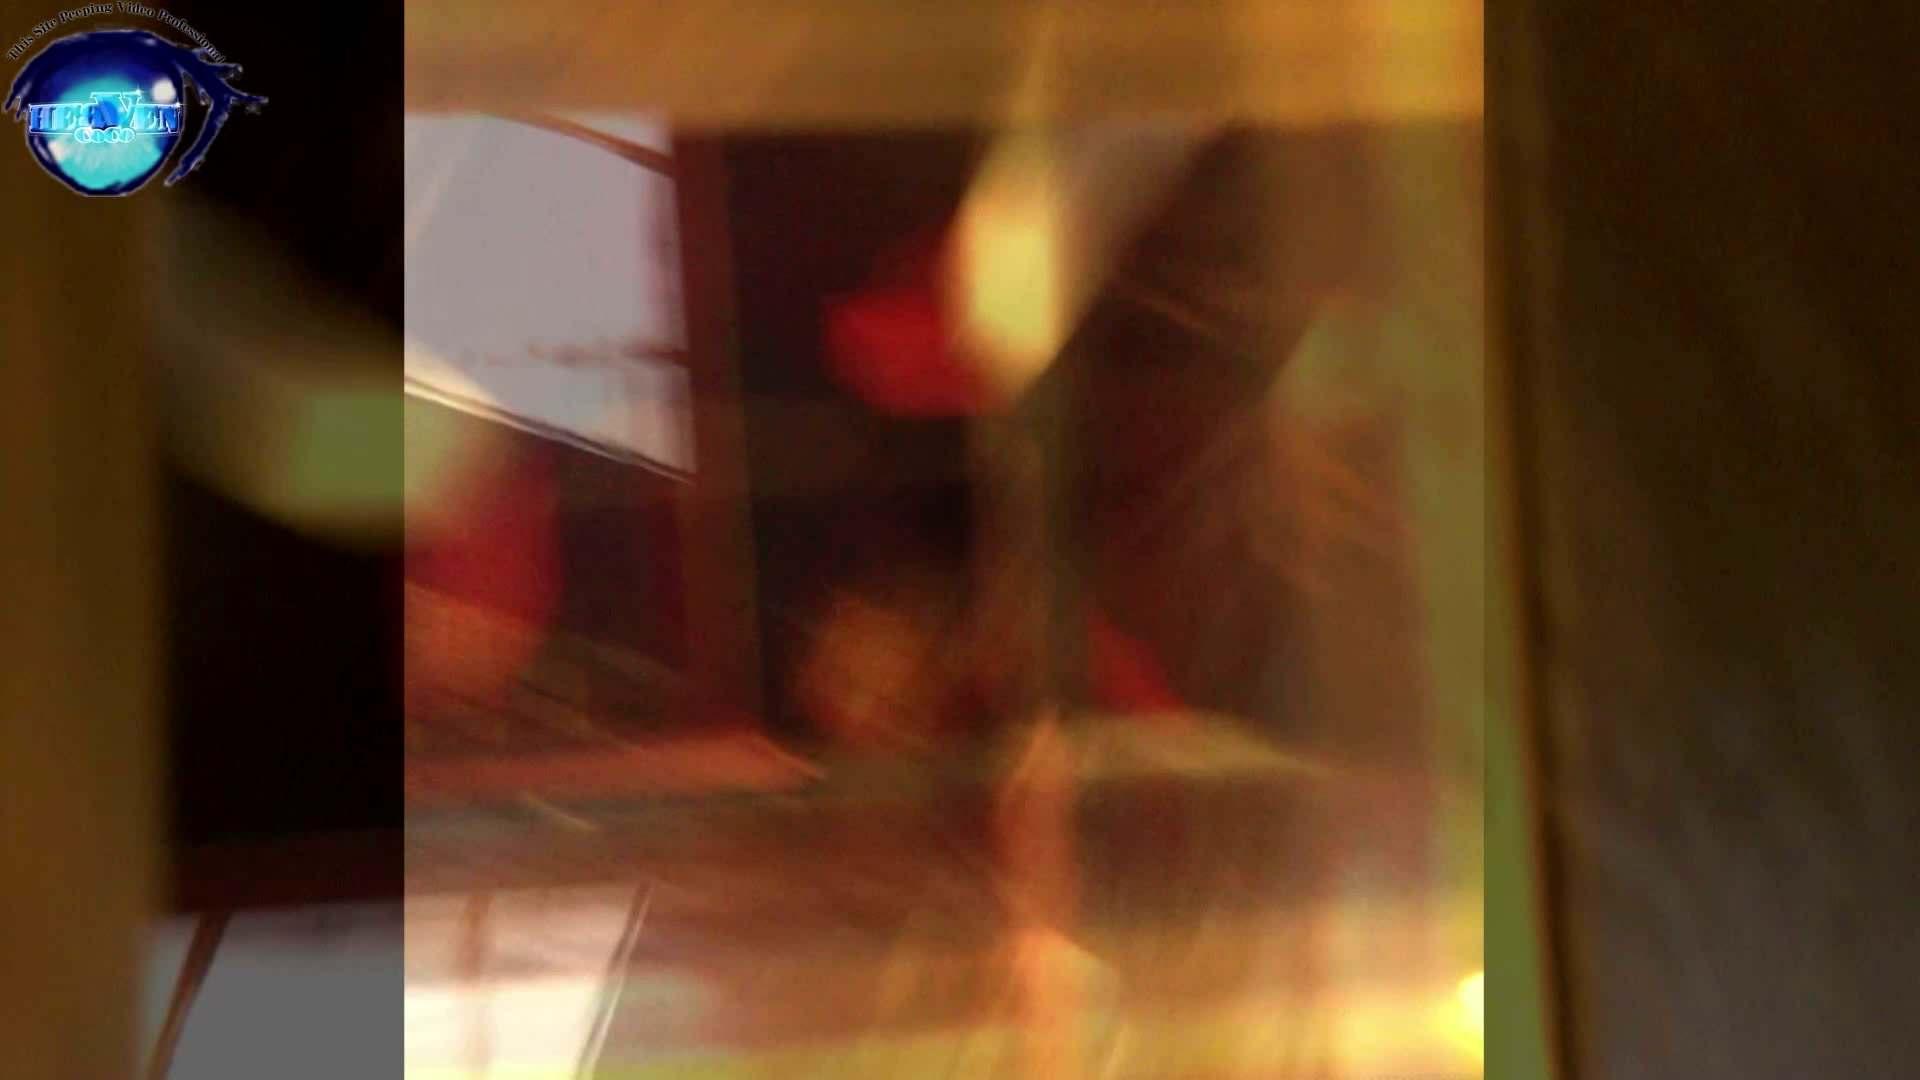 GOD HAND ファッションショッピングセンター盗撮vol.02前編 盗撮 ワレメ無修正動画無料 74連発 14